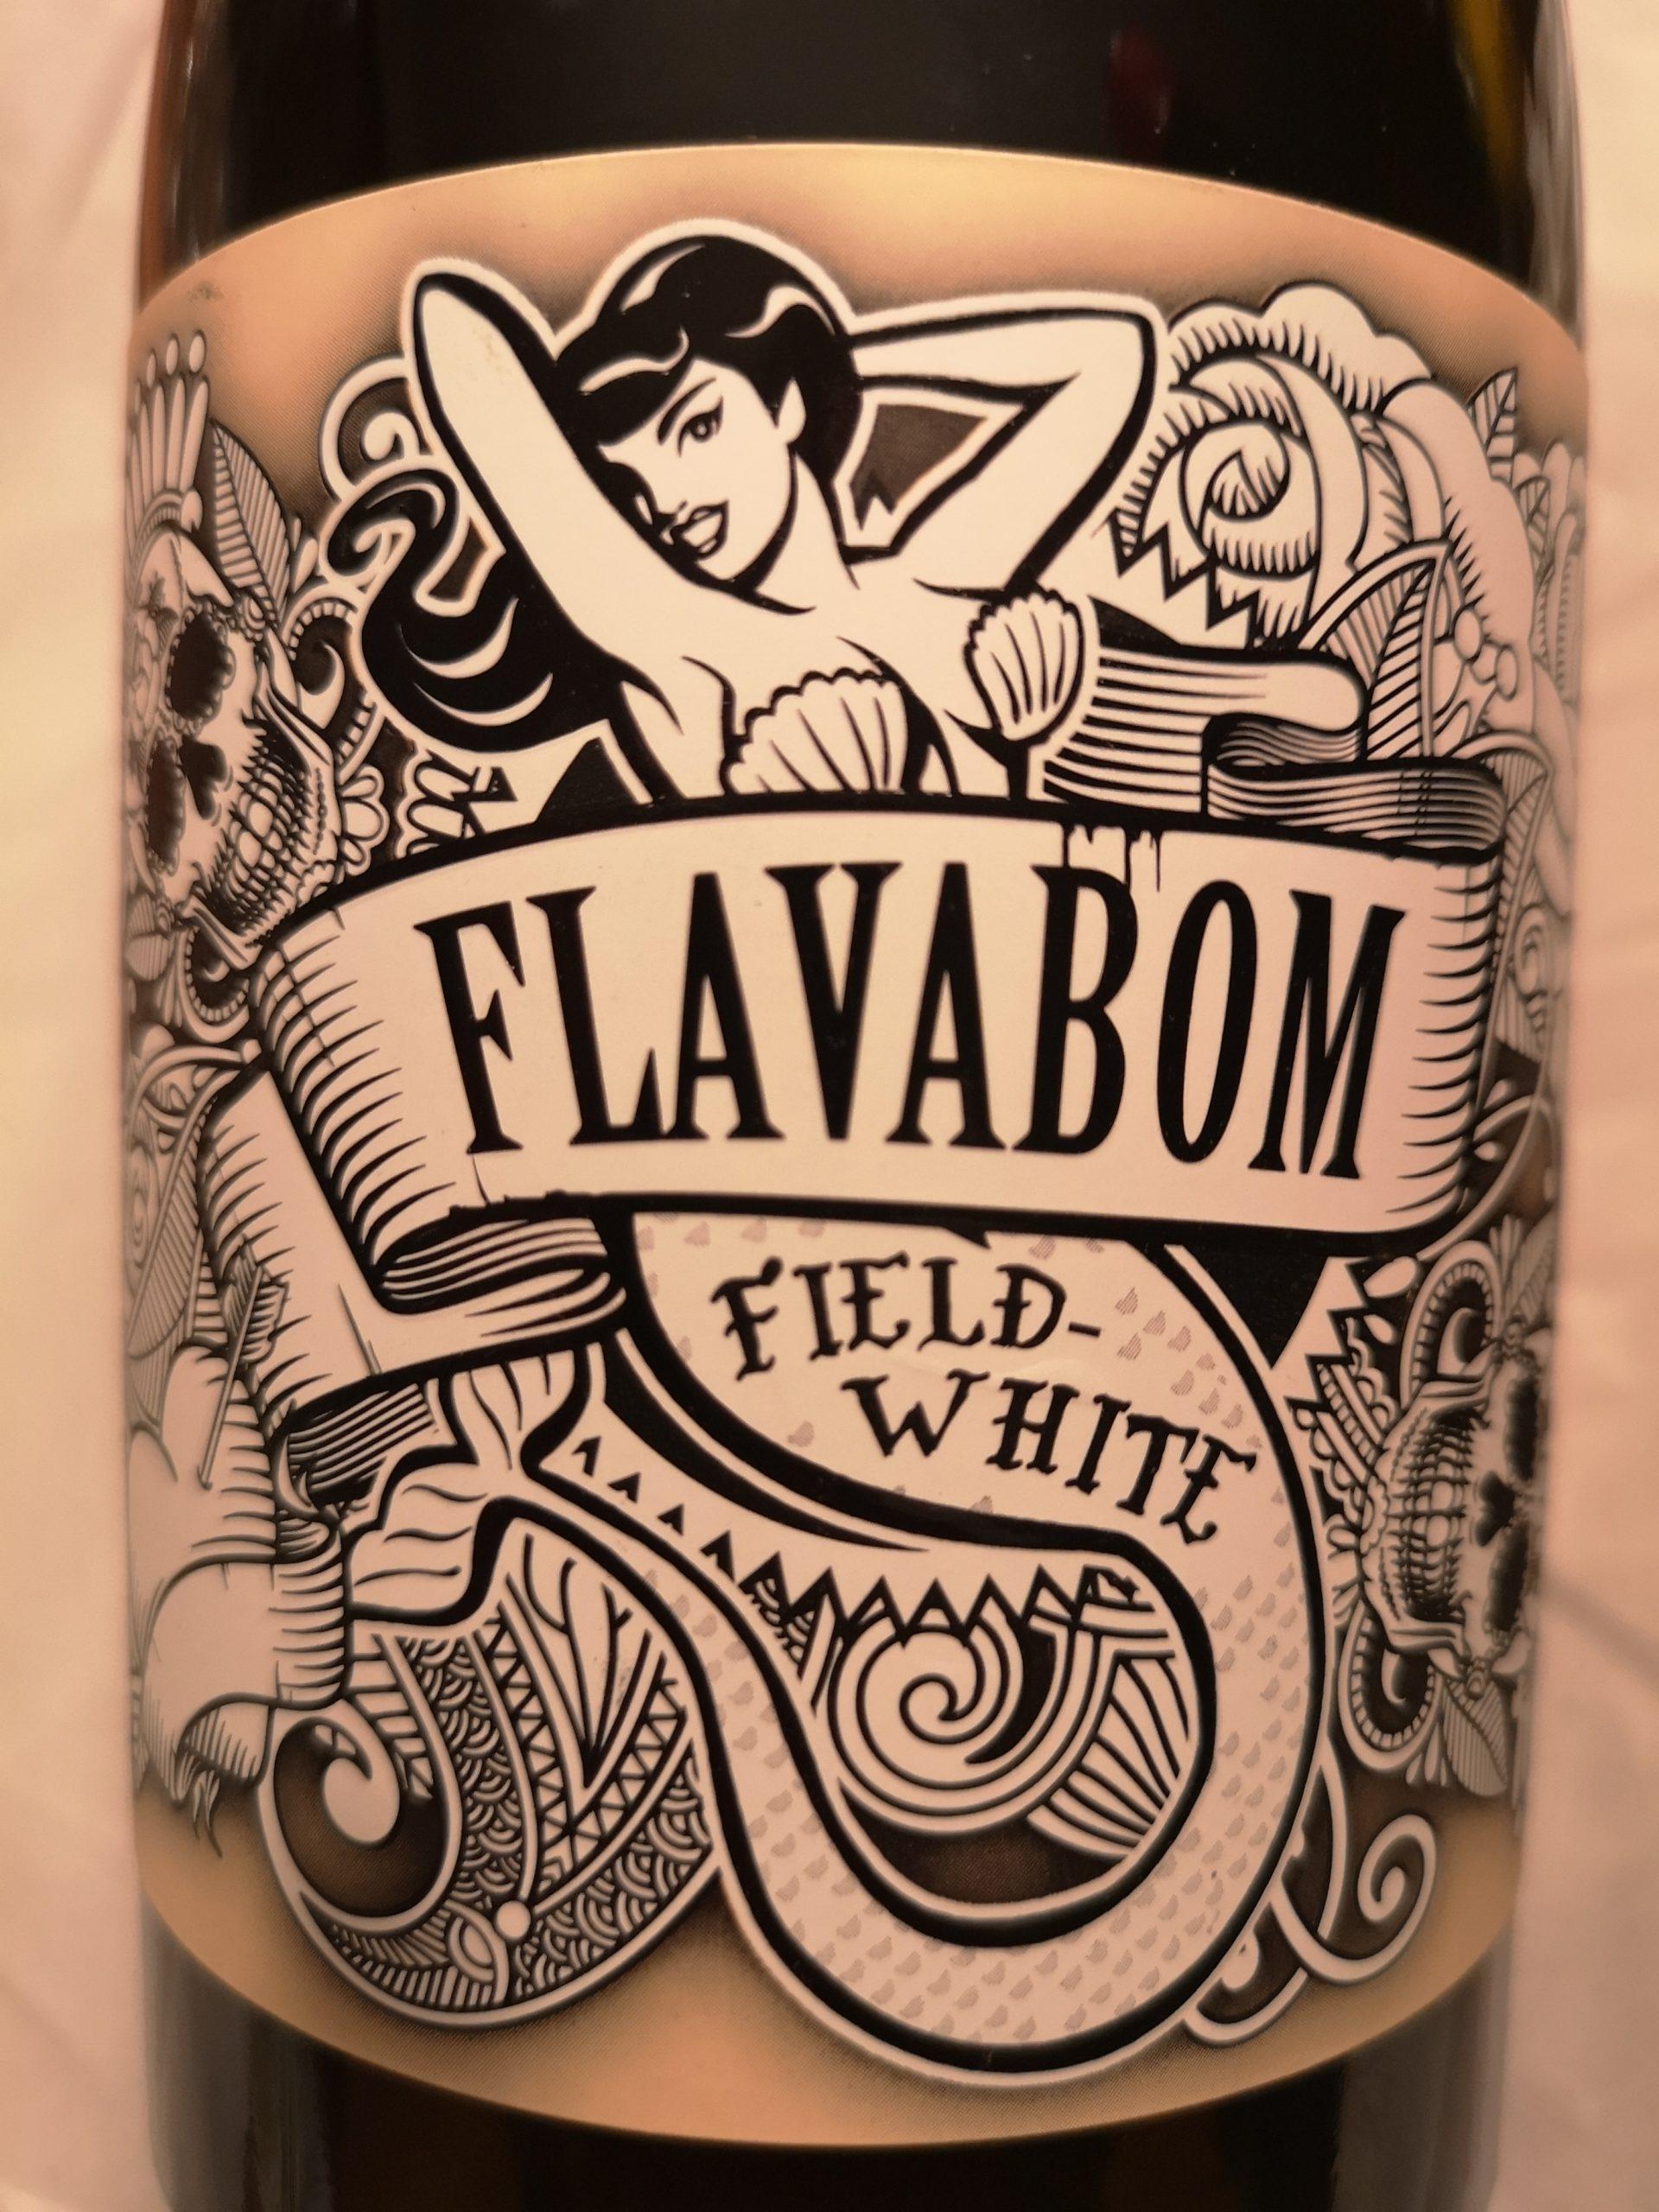 2016 Flavabom Field-White | Byrne Vineyards